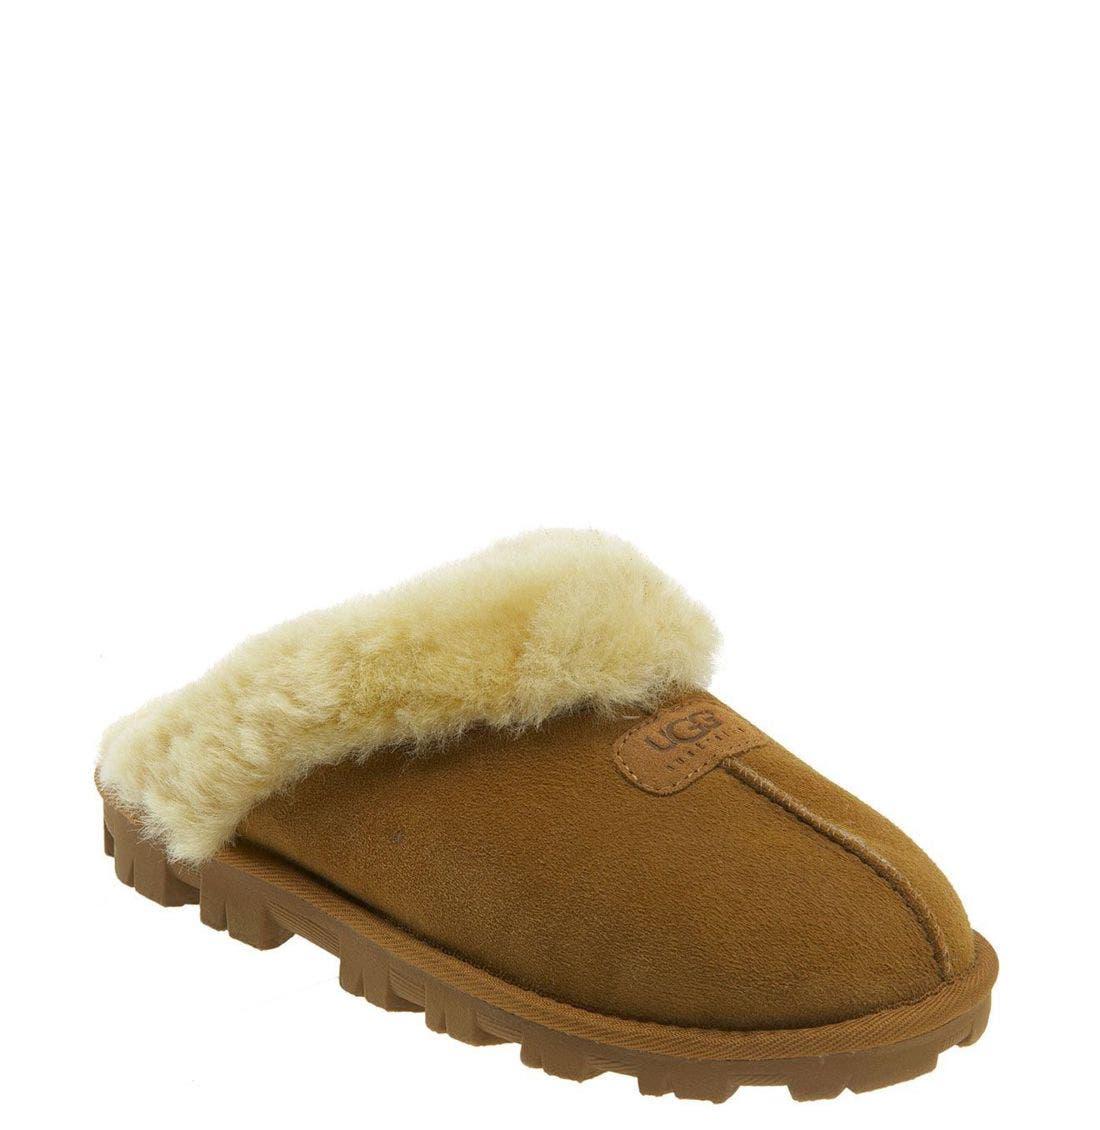 Main Image - UGG® Genuine Shearling Slipper (Women)